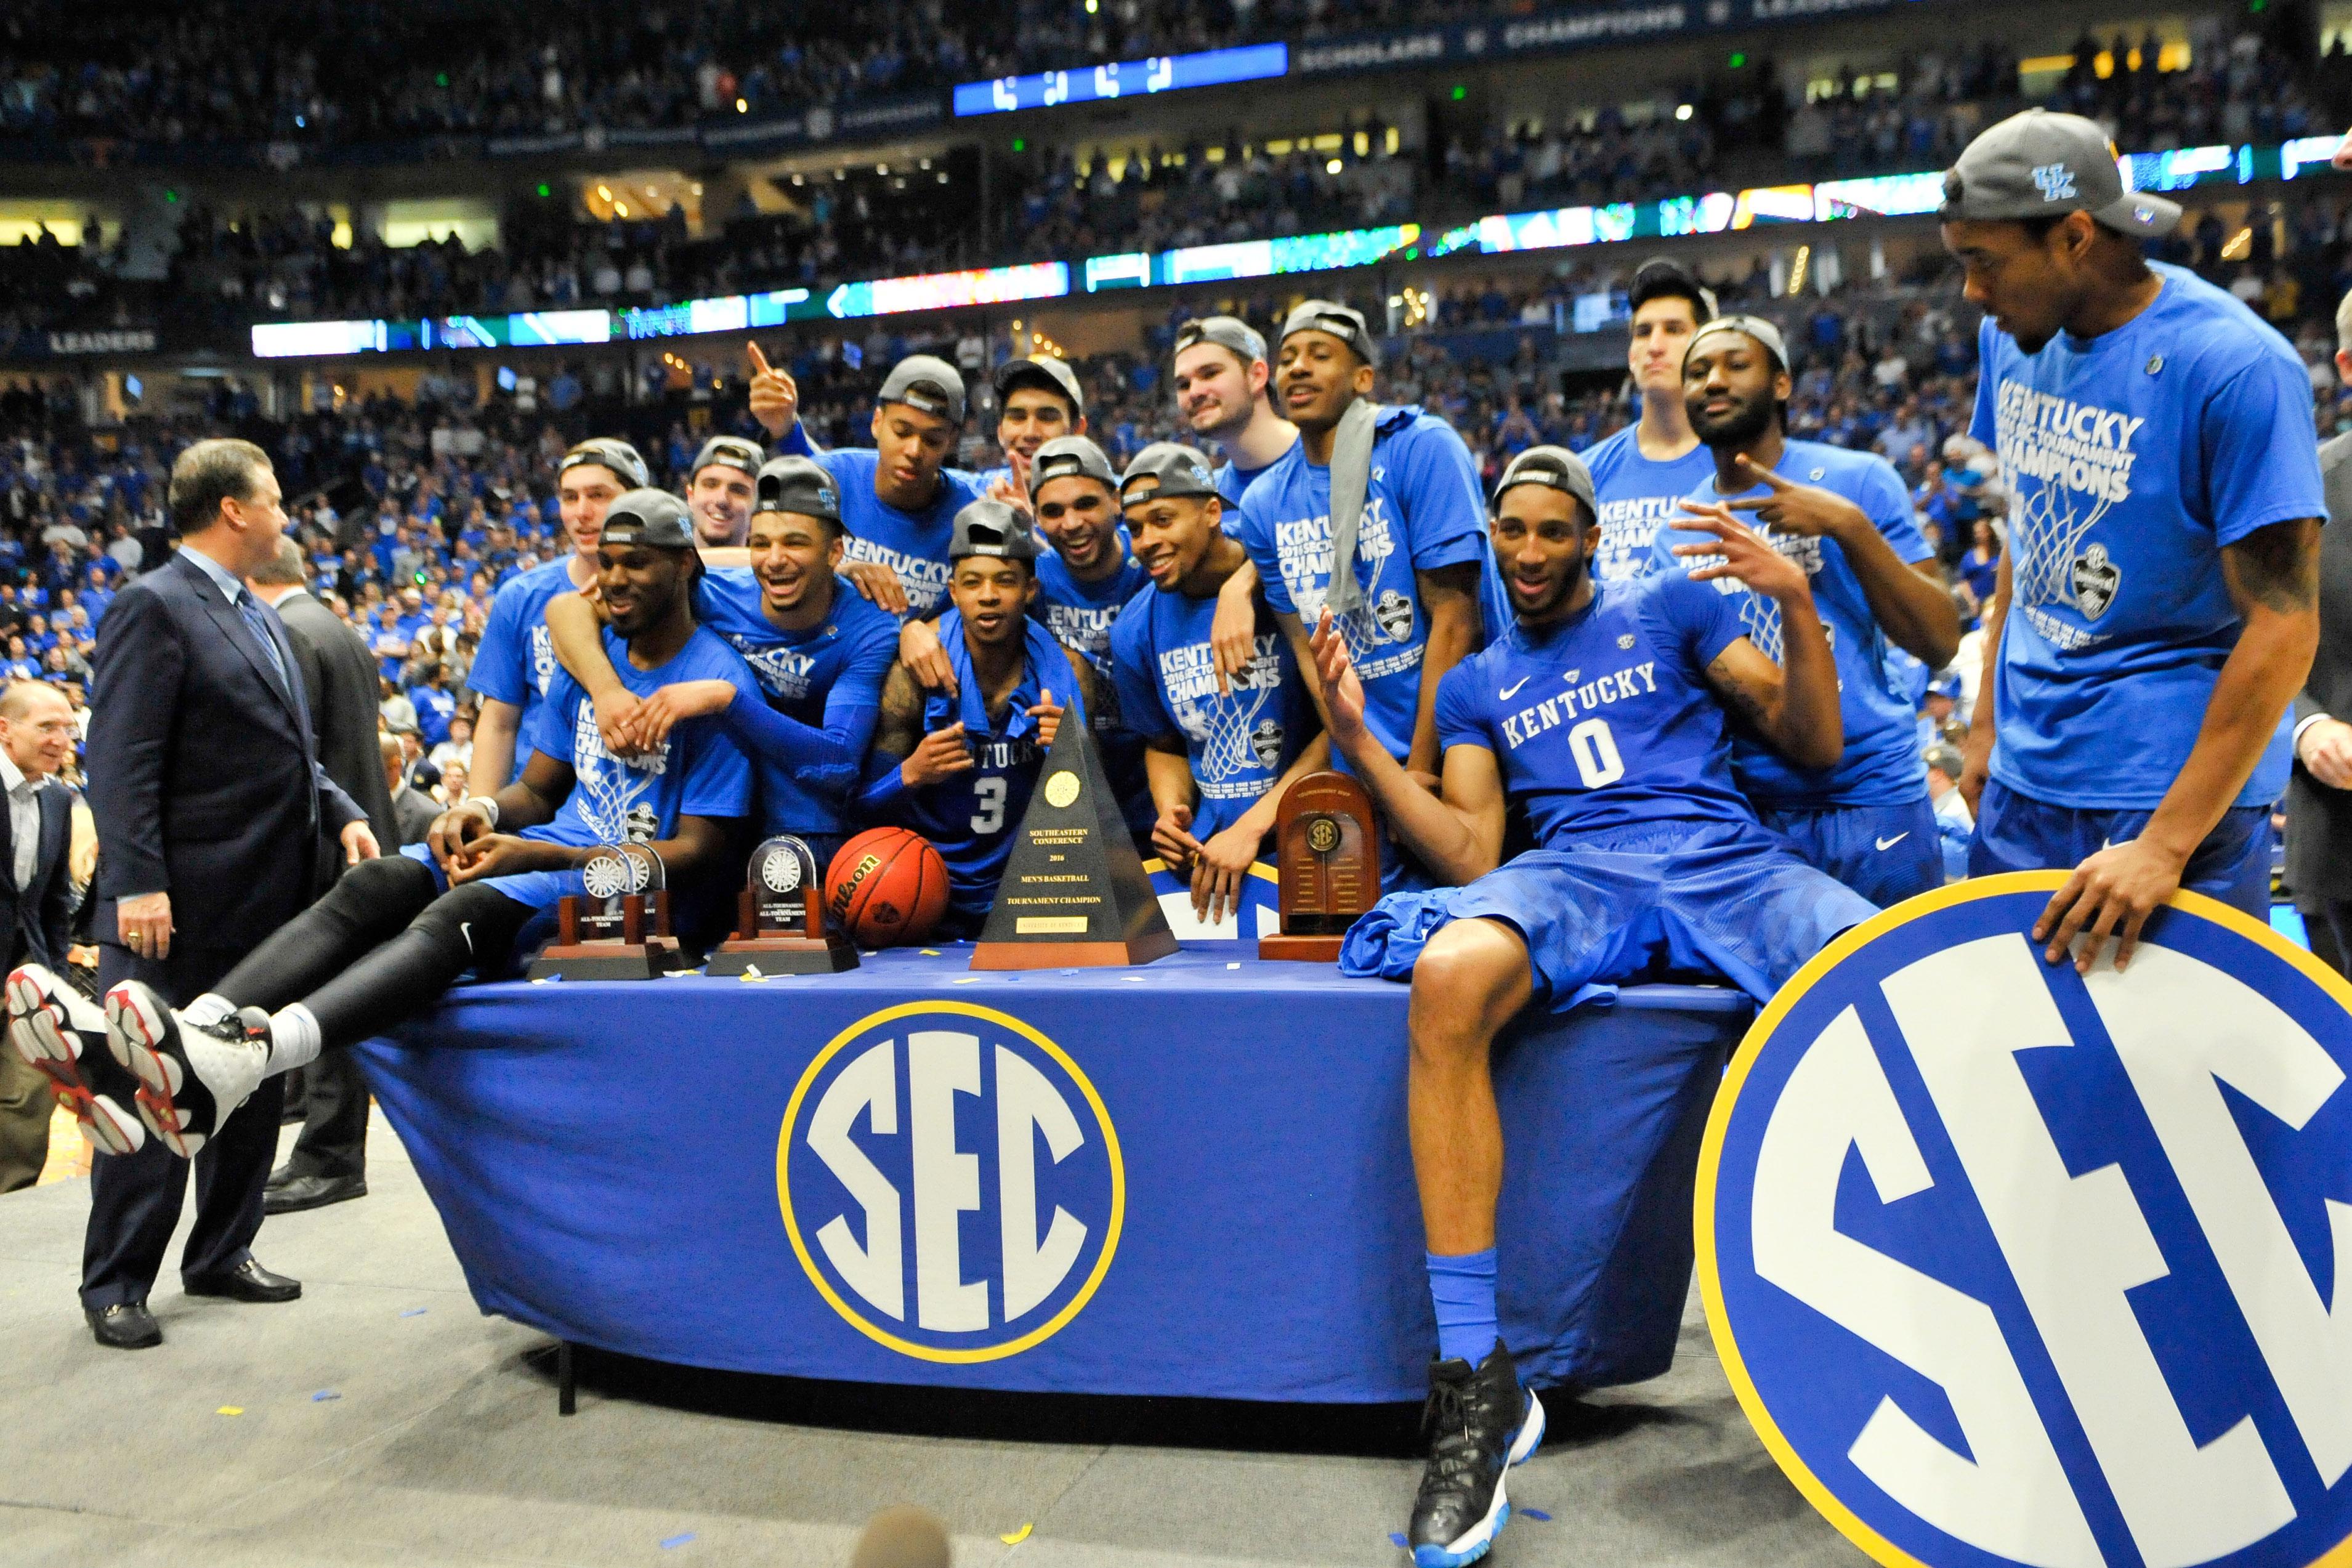 Kentucky Basketball Is An Enigma Well Into The Season: SEC Tournament: Kentucky Basketball Fans Drive Average